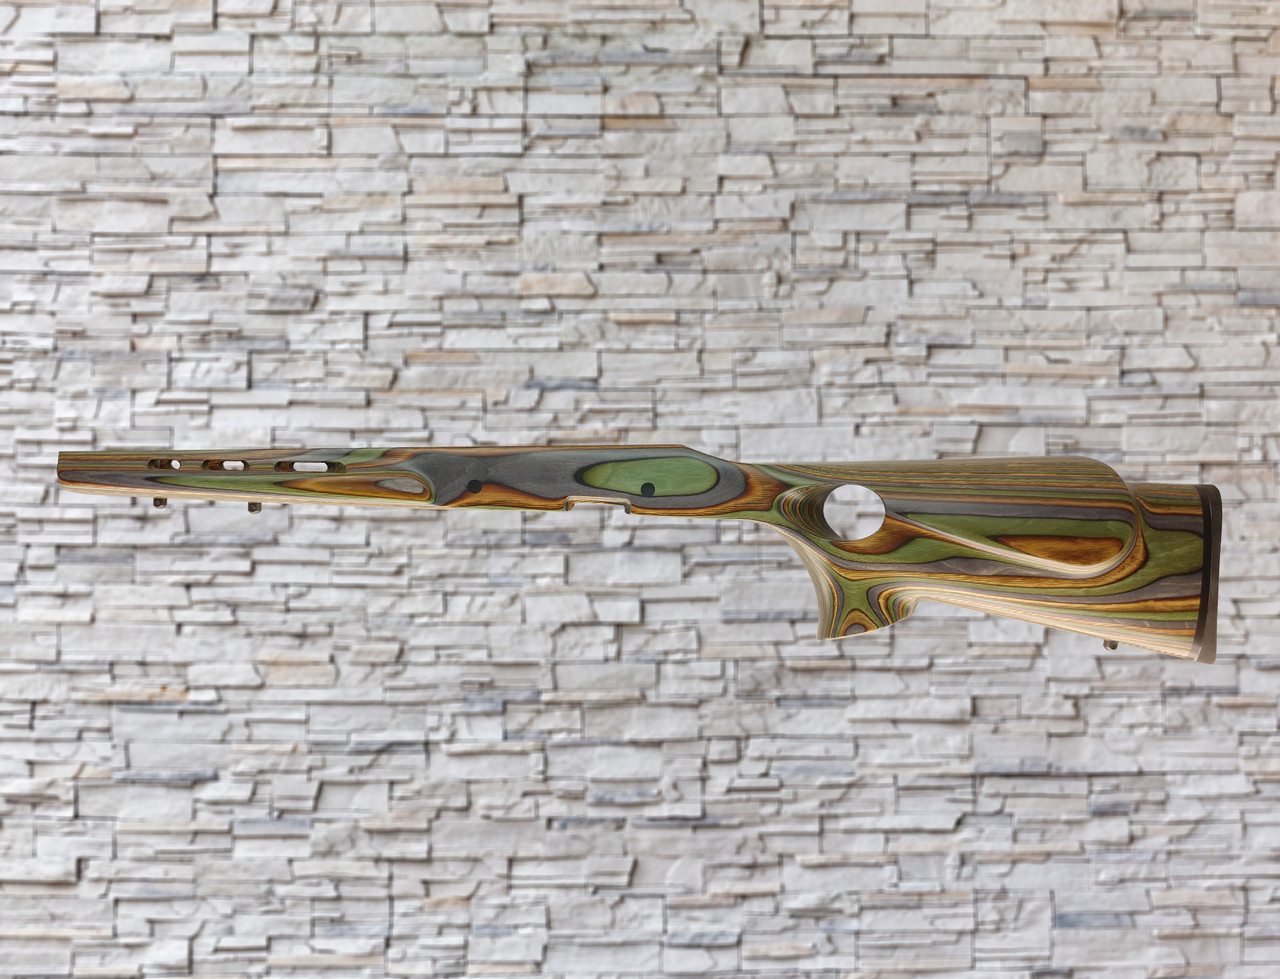 Boyds Featherweight Wood Stock Camo For Remington 700 SA Factory Detachable Magazine